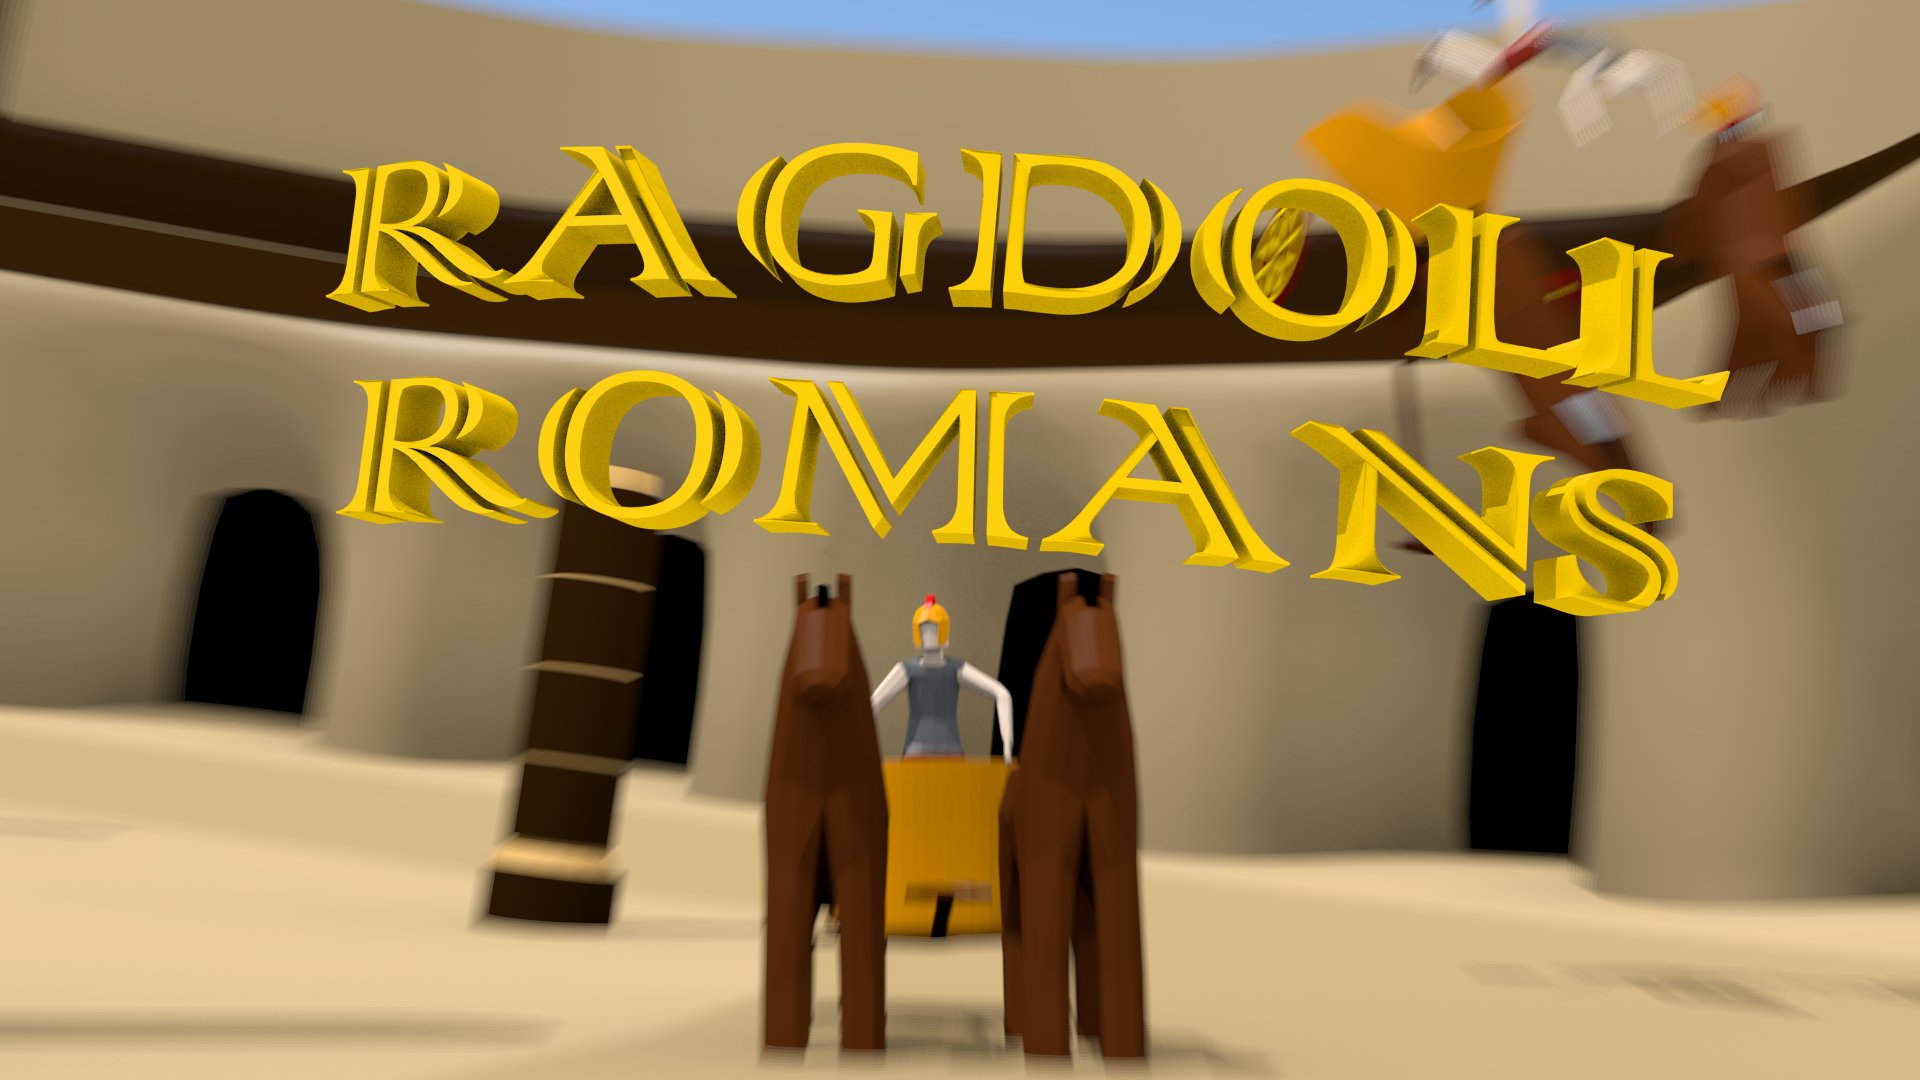 Ragdoll Romans